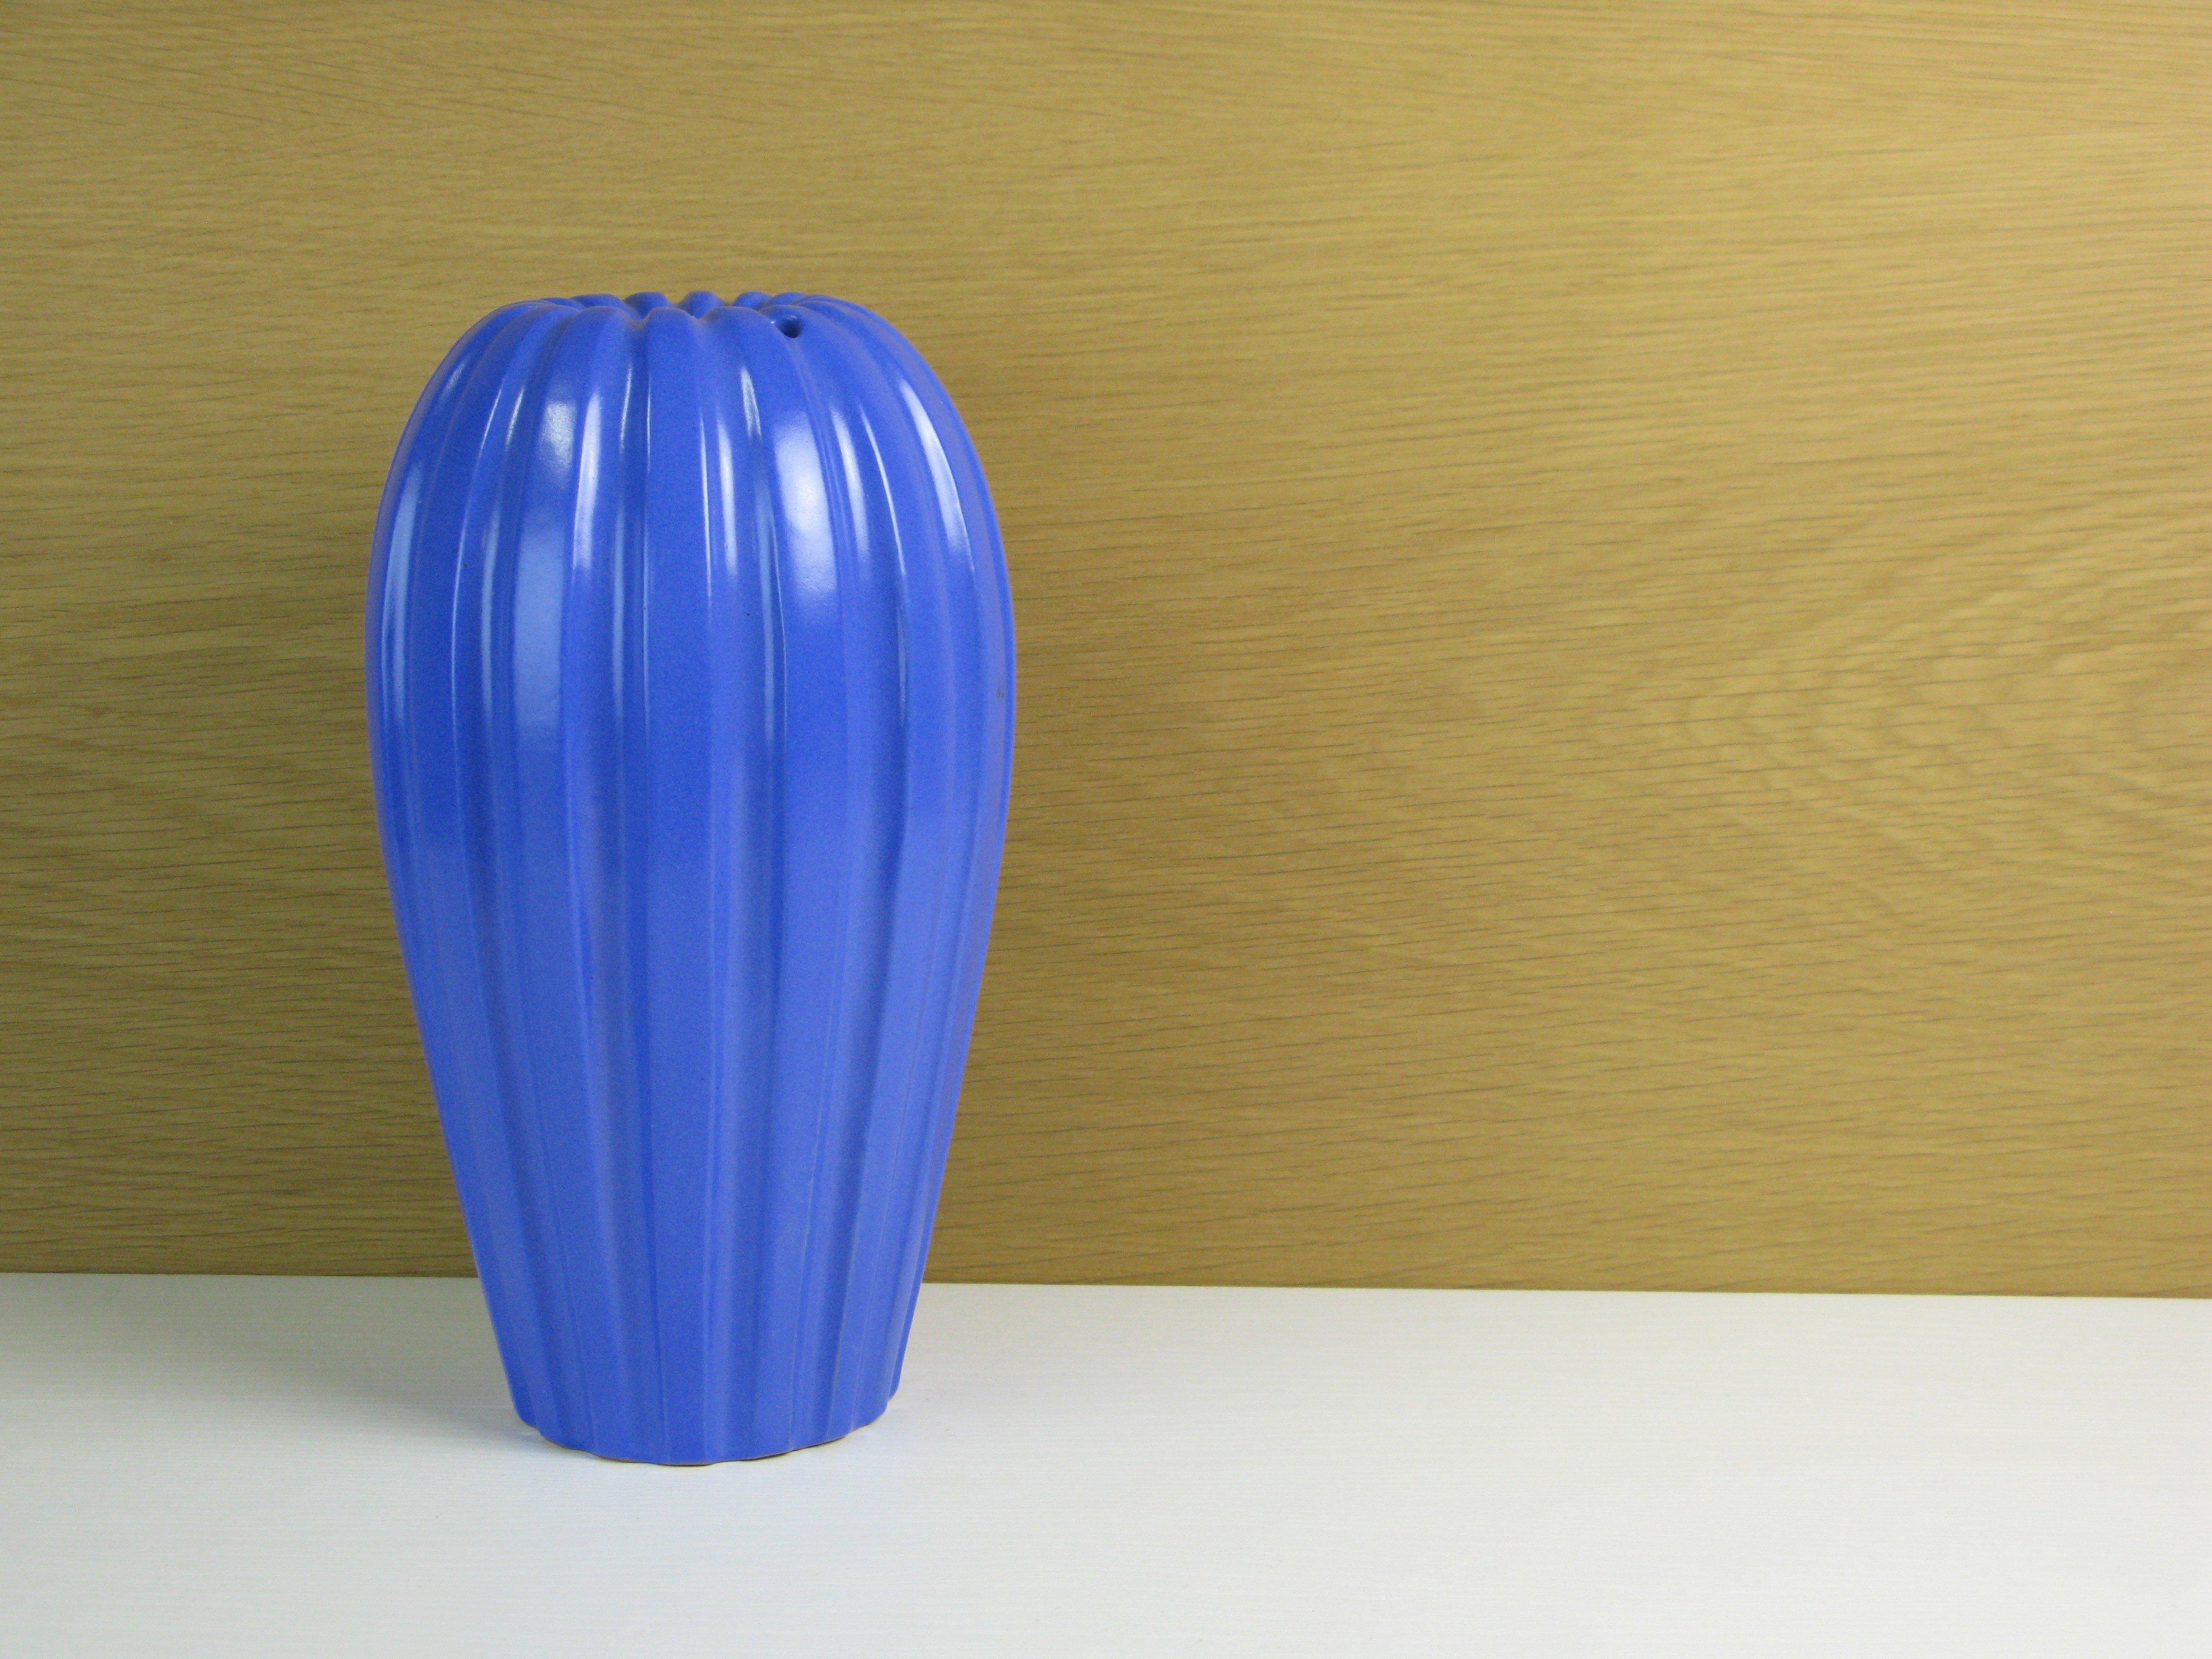 blue vase 479